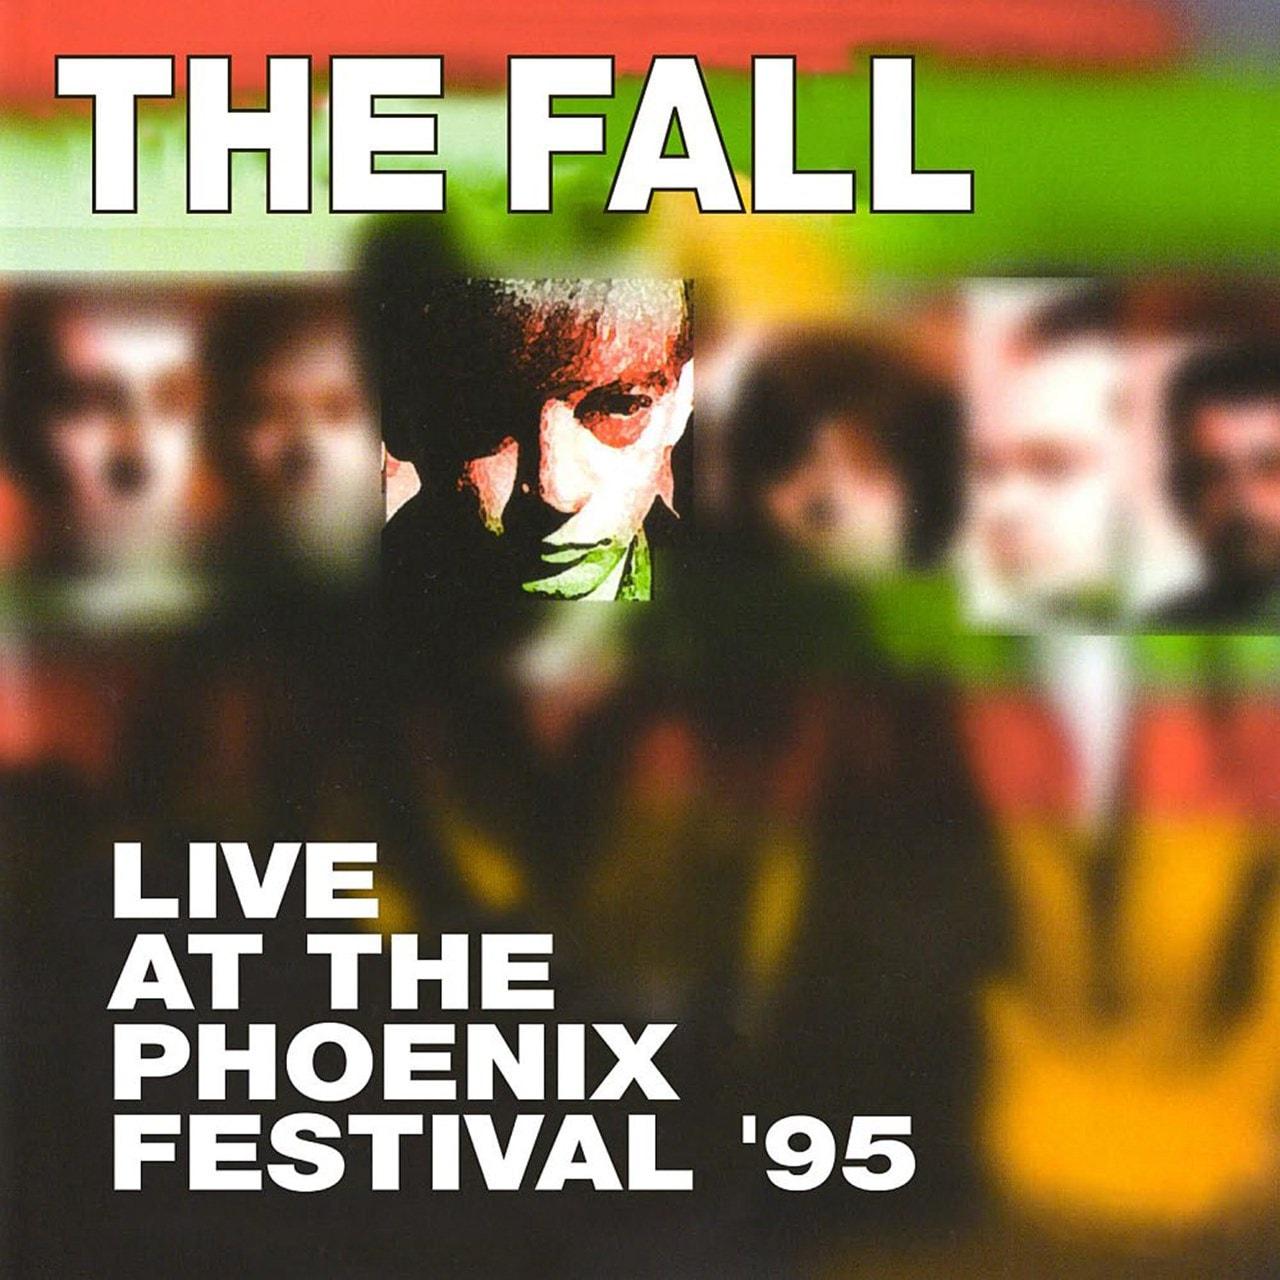 Live at the Phoenix Festival '95 - 1